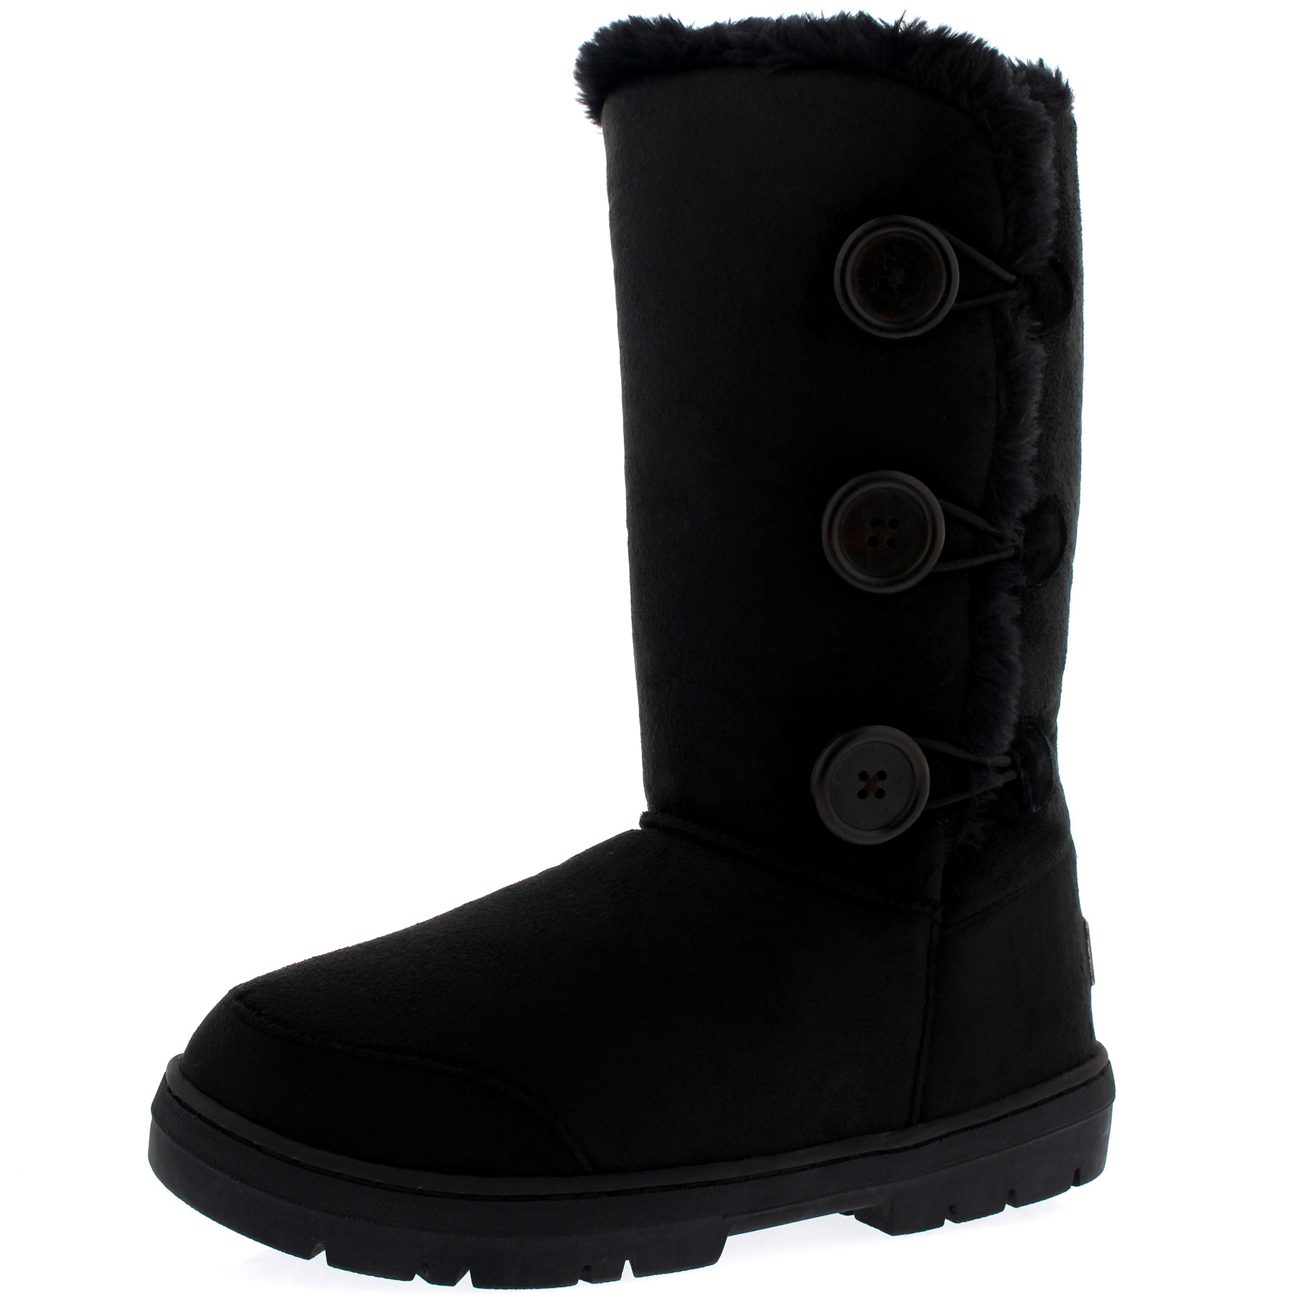 Womens Triplet Button Tall Classic Fur Waterproof Winter Rain Snow Boots 3-9